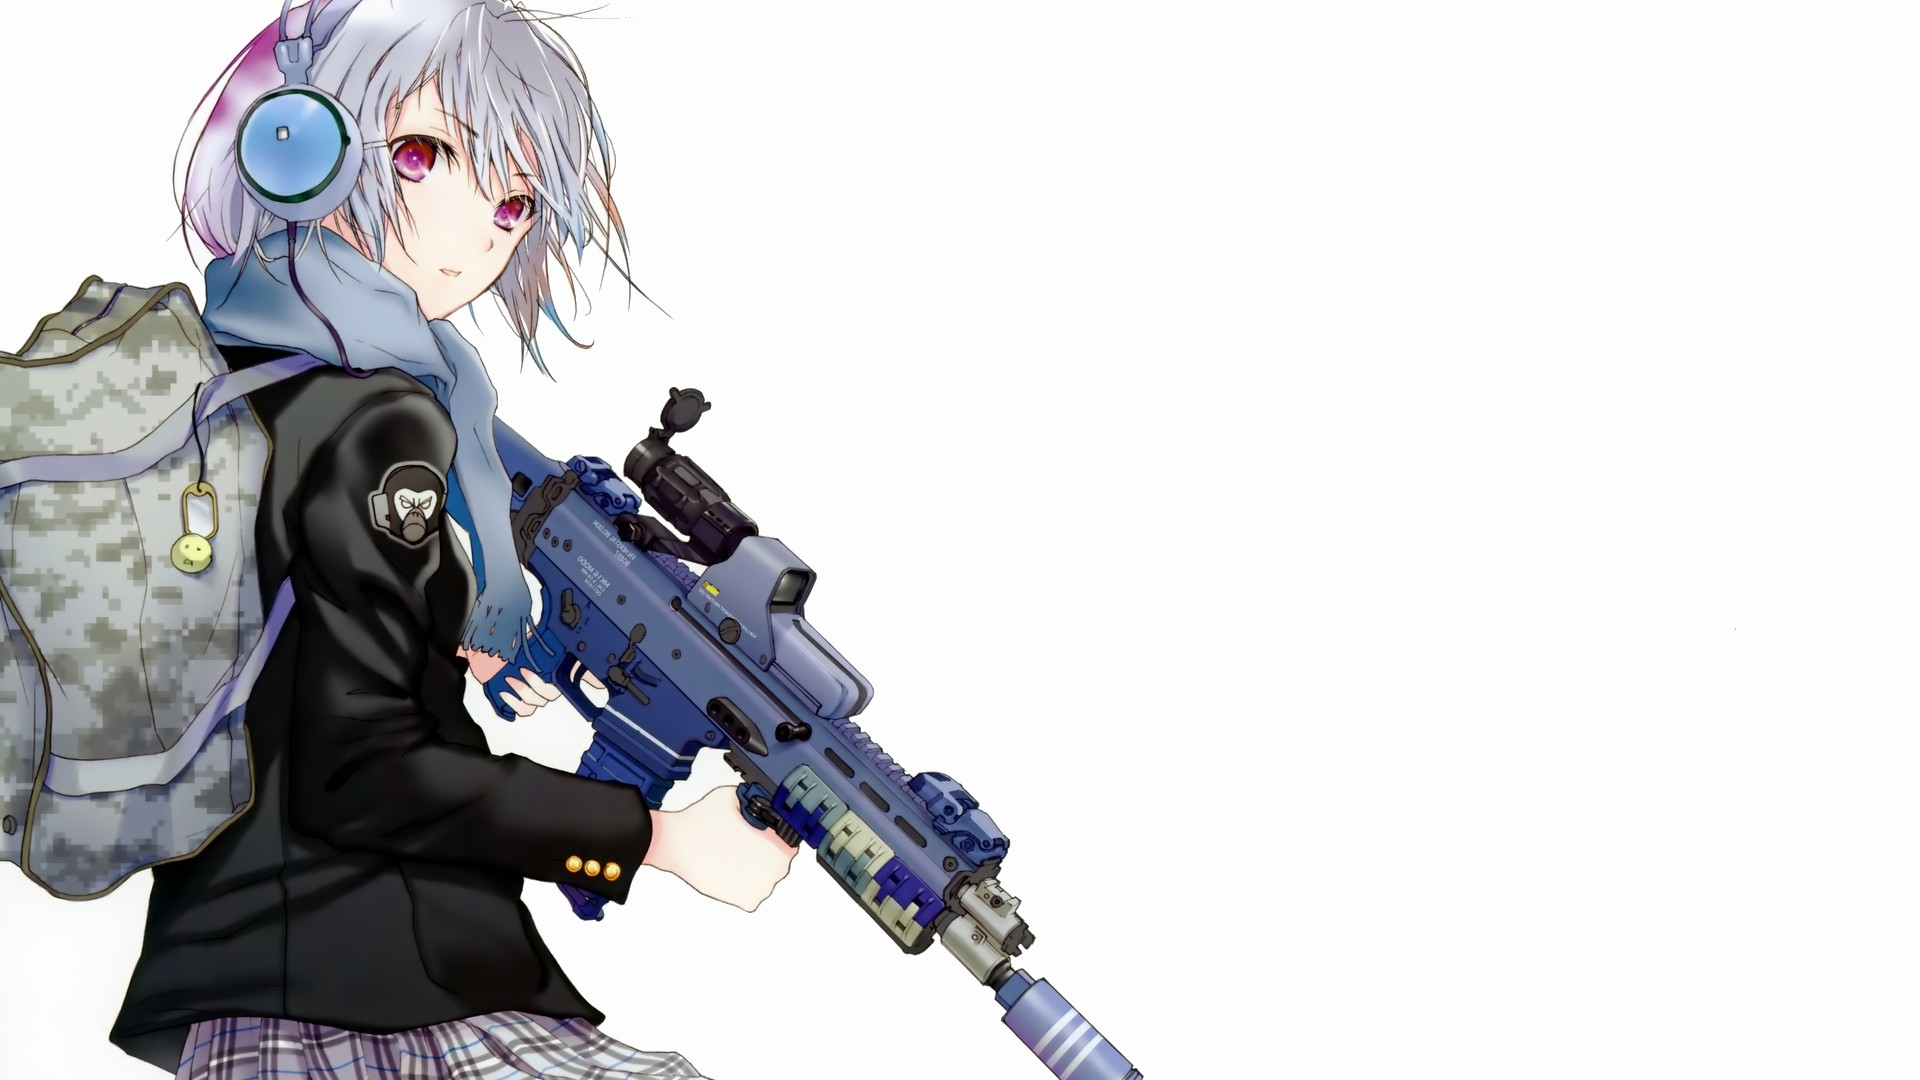 Anime Girl HD Wallpaper 1080p - WallpaperSafari